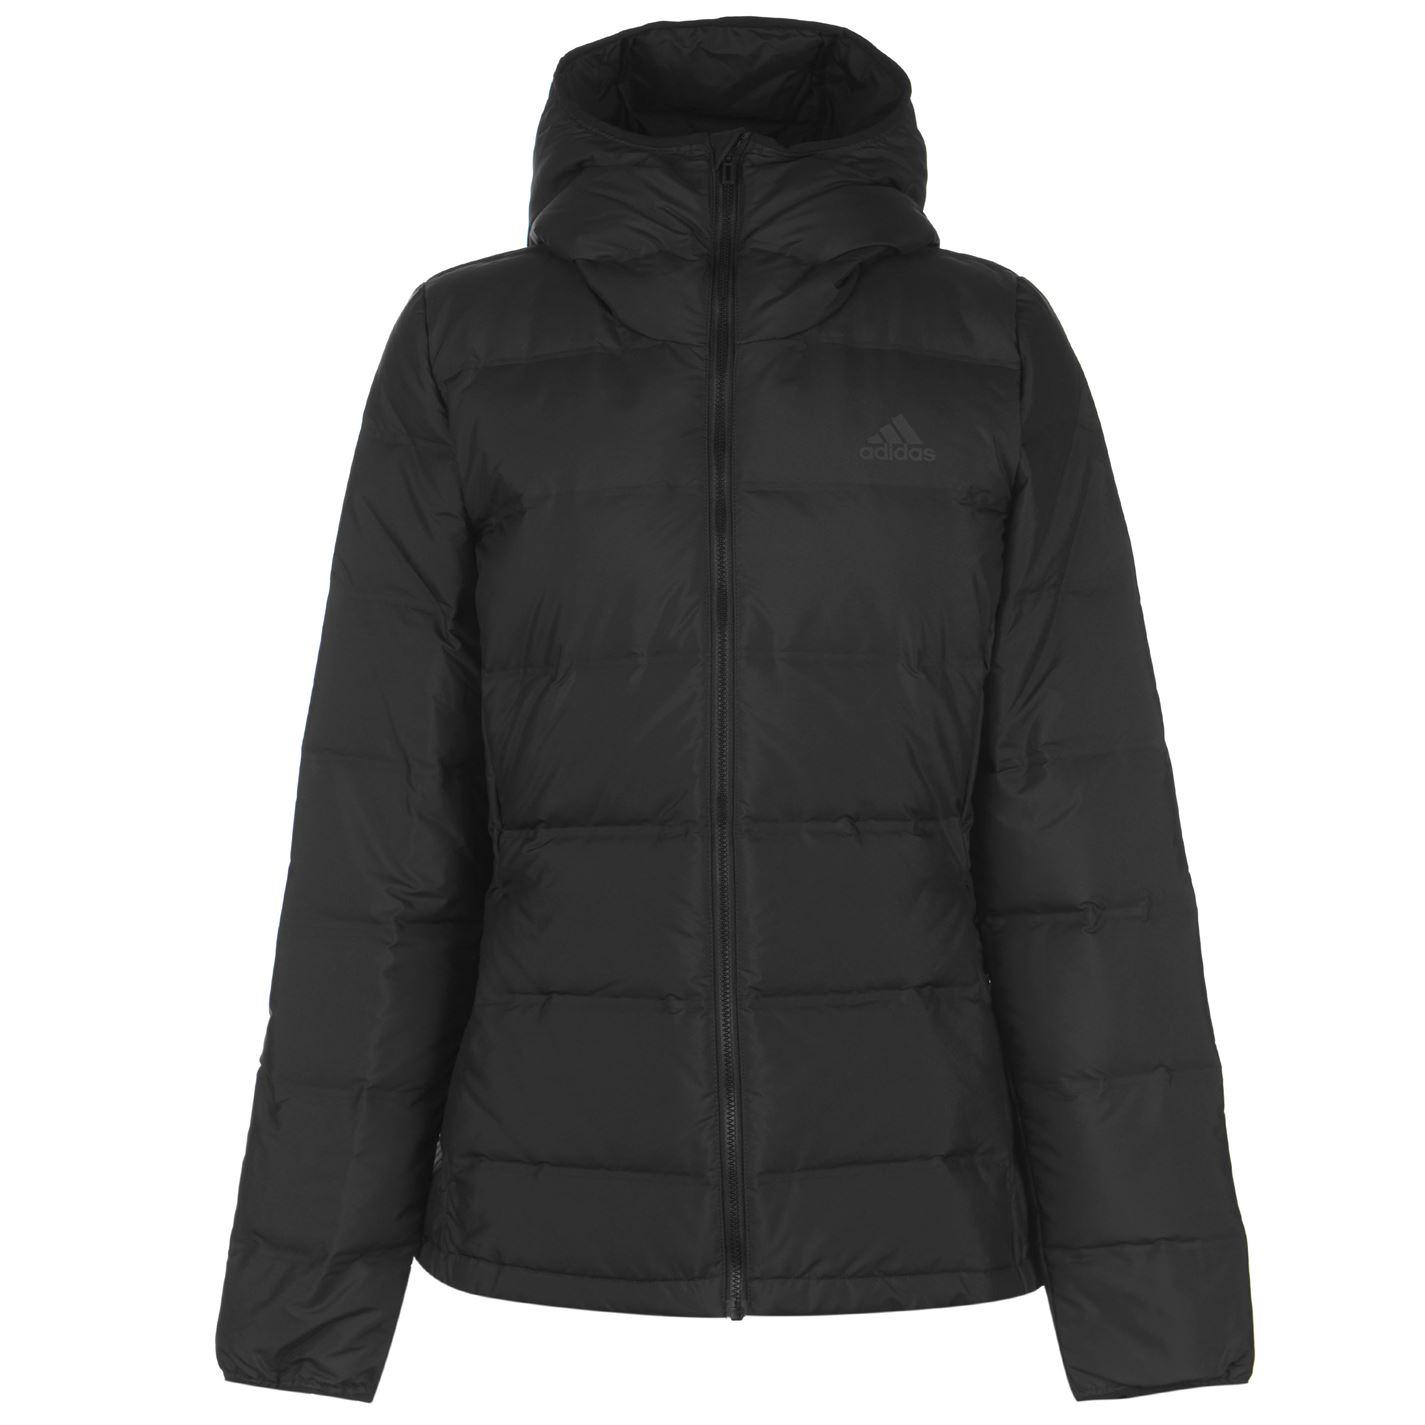 Adidas Helionic Jacket Ladies